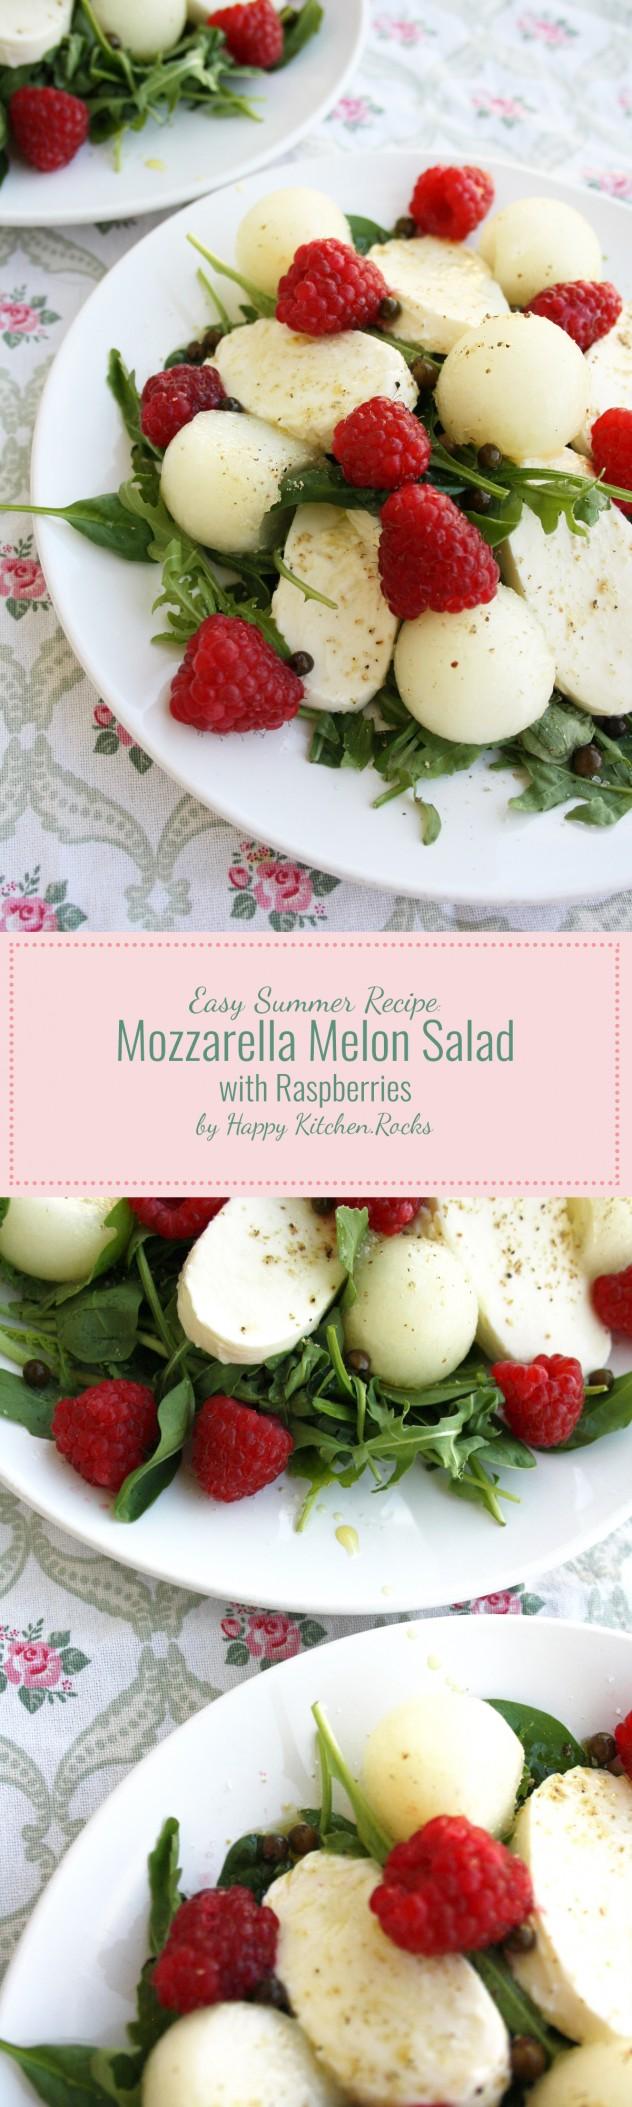 Mozzarella Melon Salad with Raspberries - a quick summer melon salad recipe with mozzarella, baby spinach, arugula and raspberries.